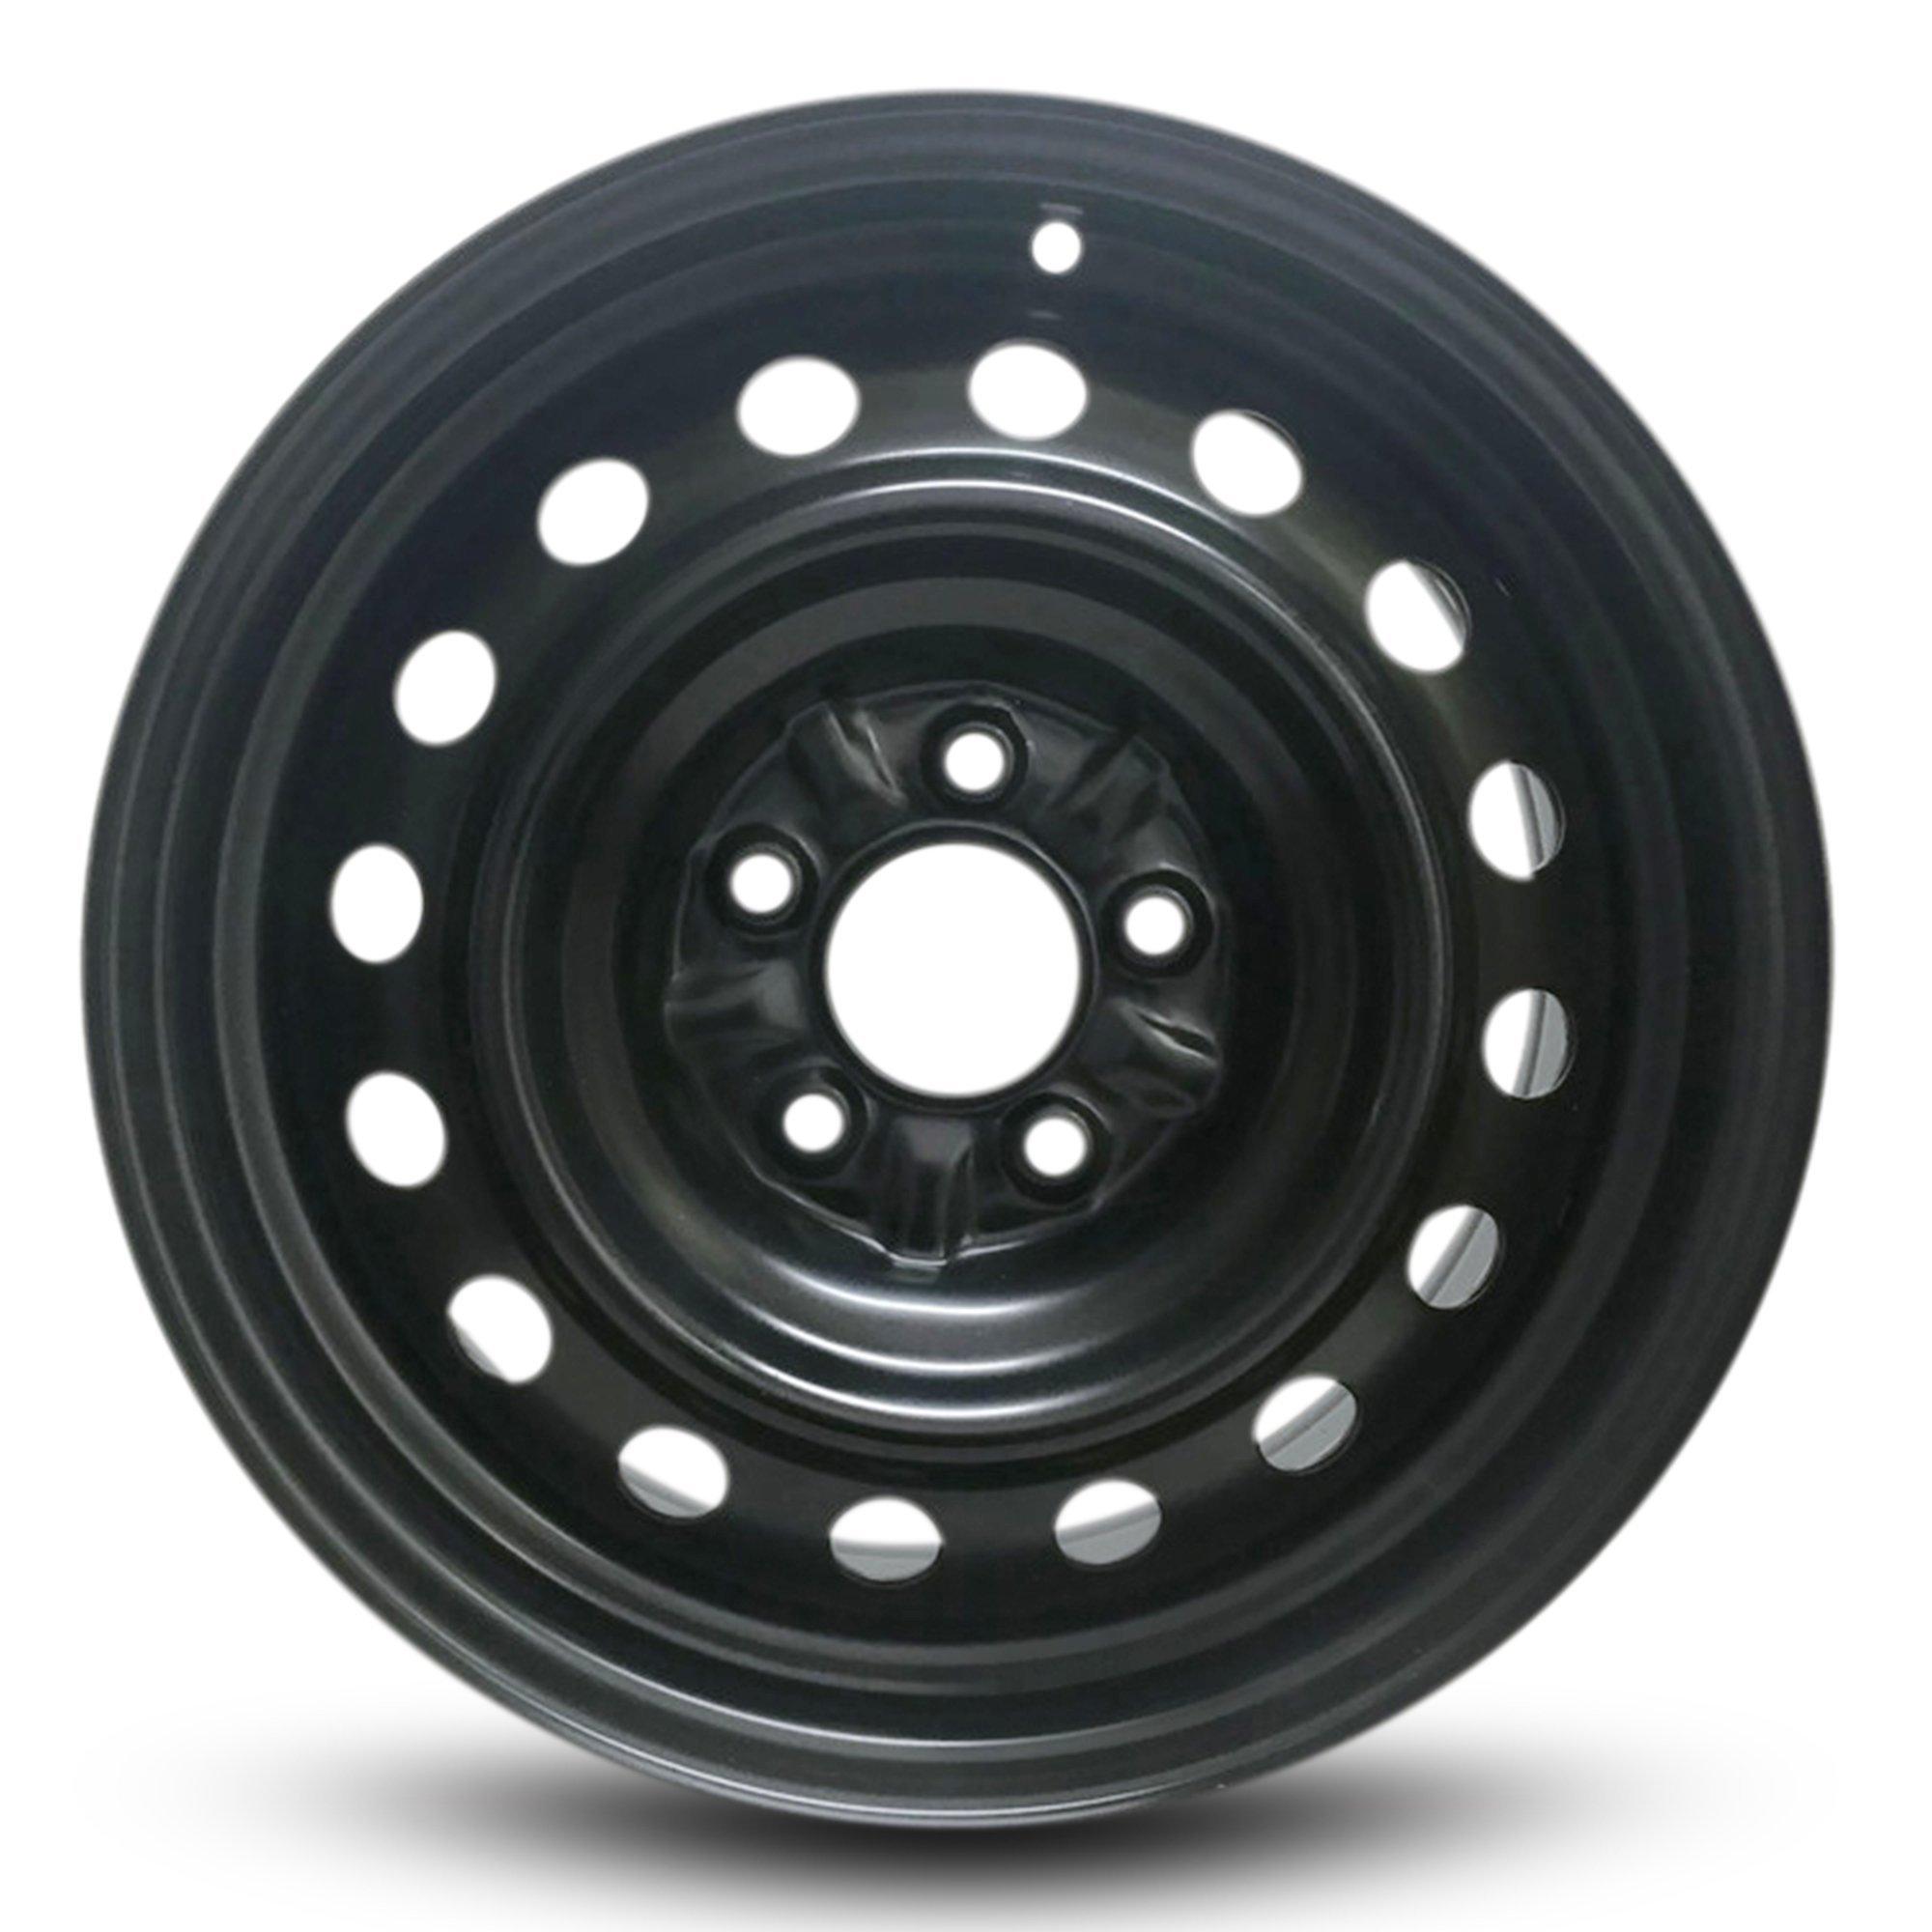 Hyundai Sonata 16 Inch 5 Lug Steel Rim/16x6.5 5-114.3 Steel Wheel Rim Center bore : 67.1mm by Road Ready Wheels (Image #1)